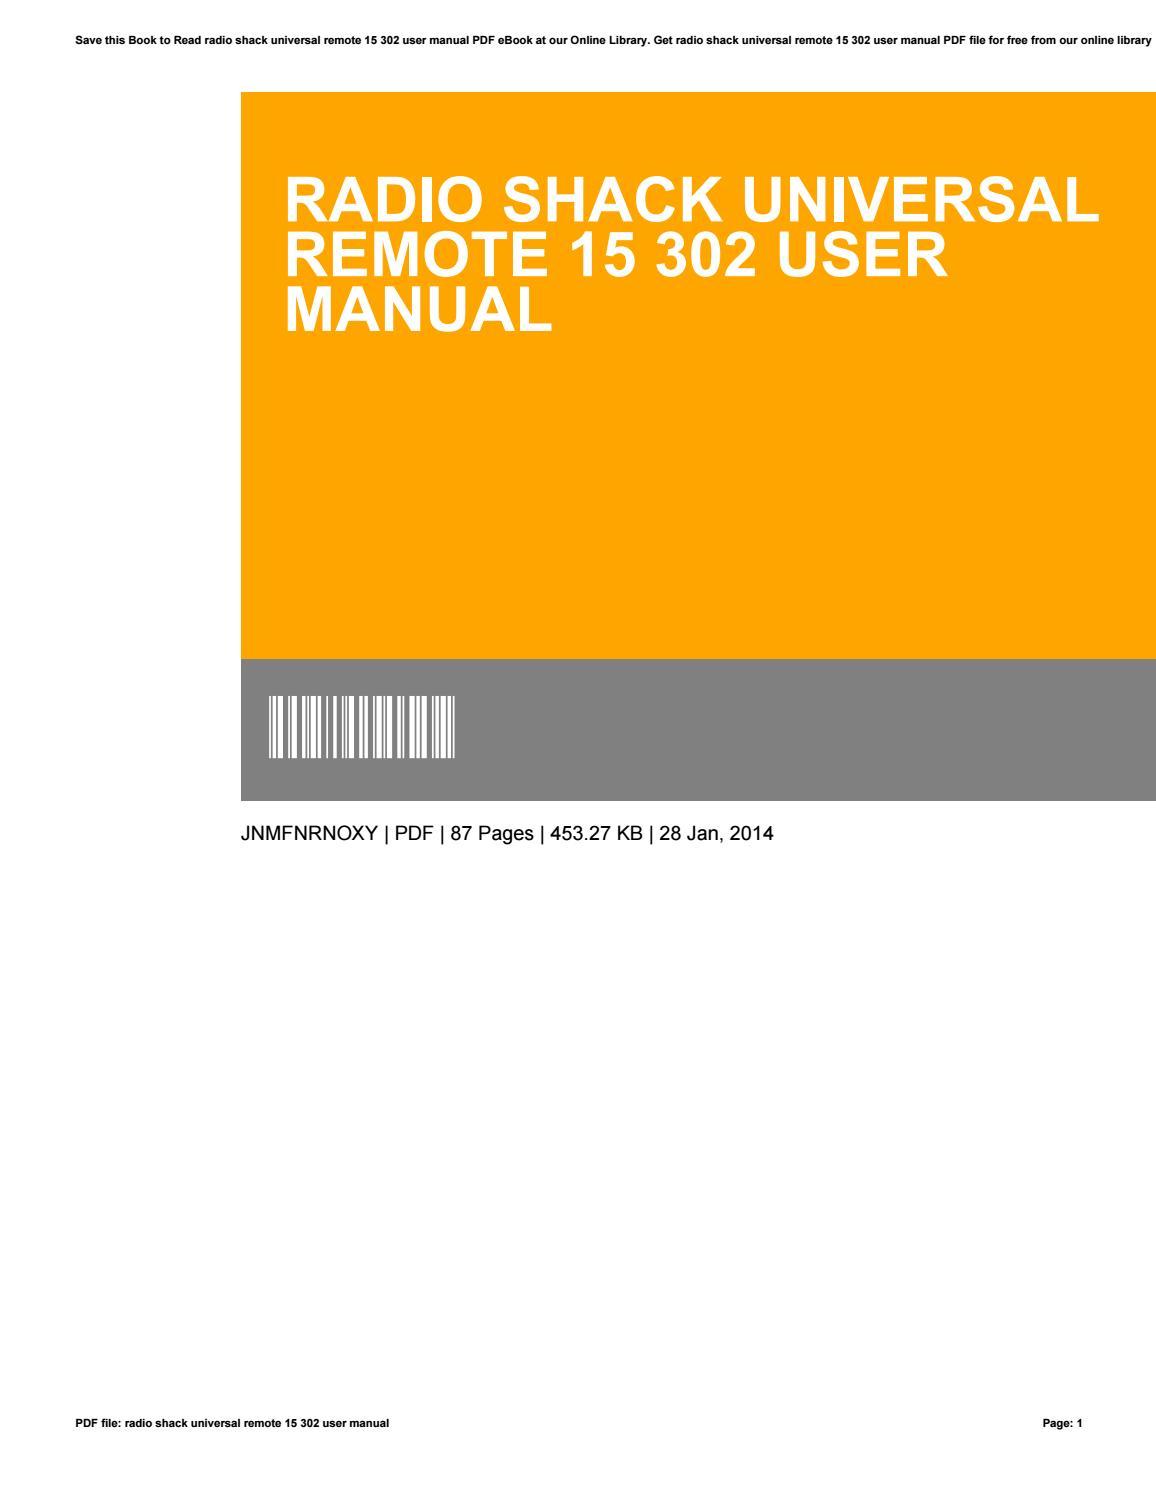 Radio shack universal remote 15 302 user manual by WilliamTerrazas1566 -  issuu